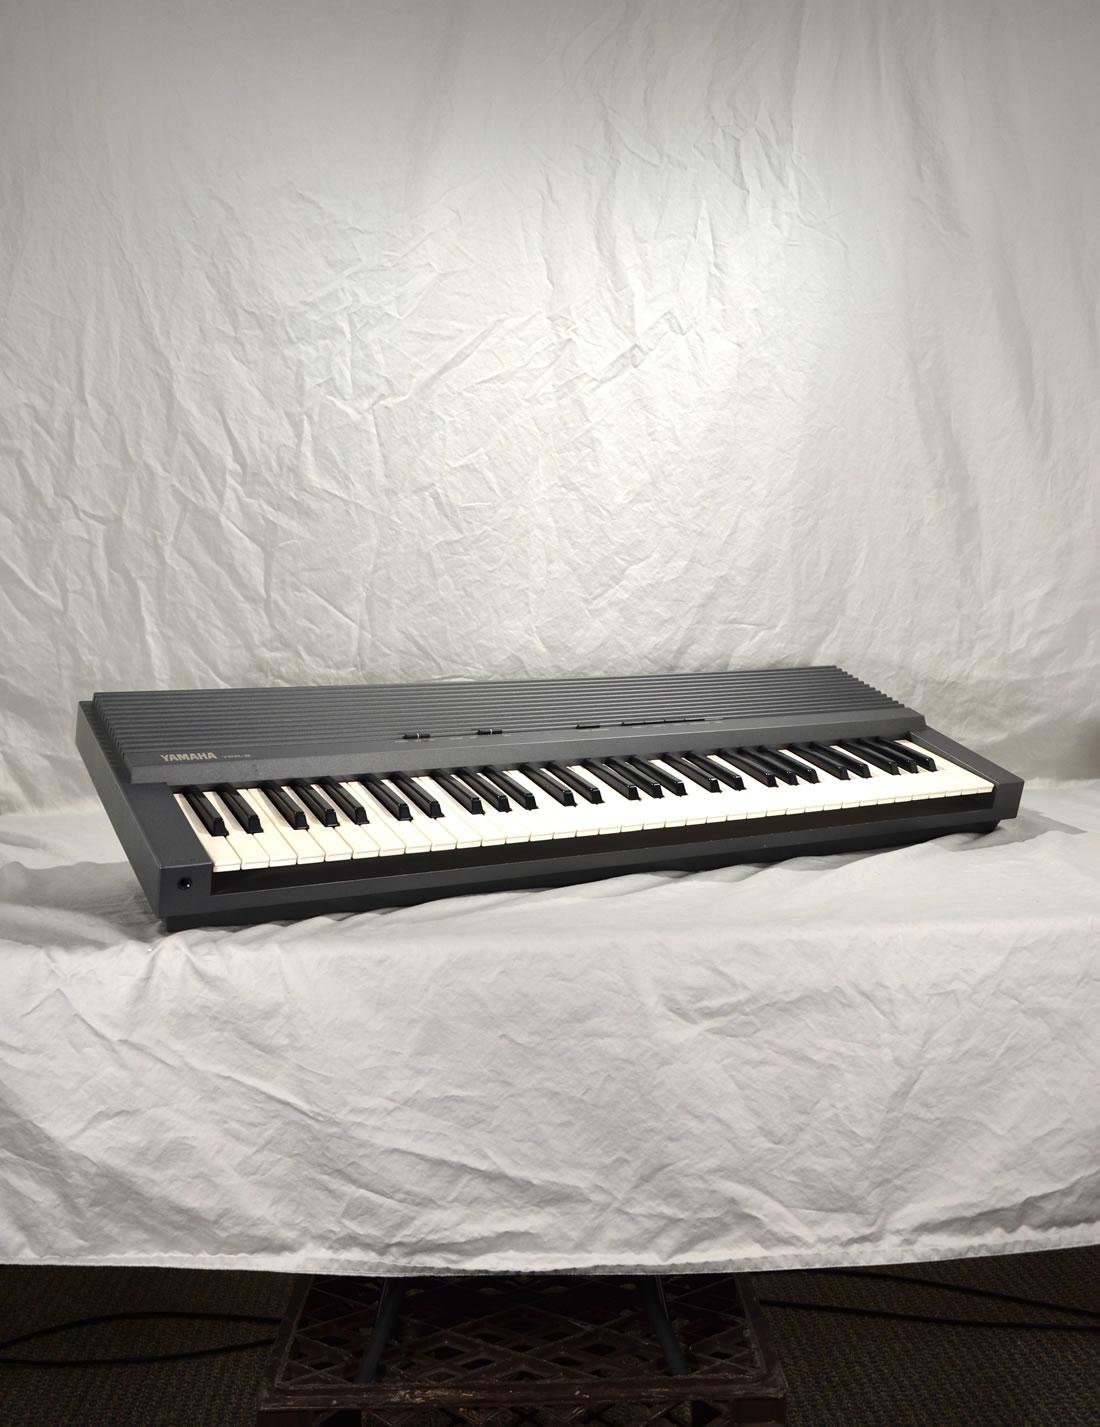 Yamaha YPR-6 YPR-8 Portable Piano